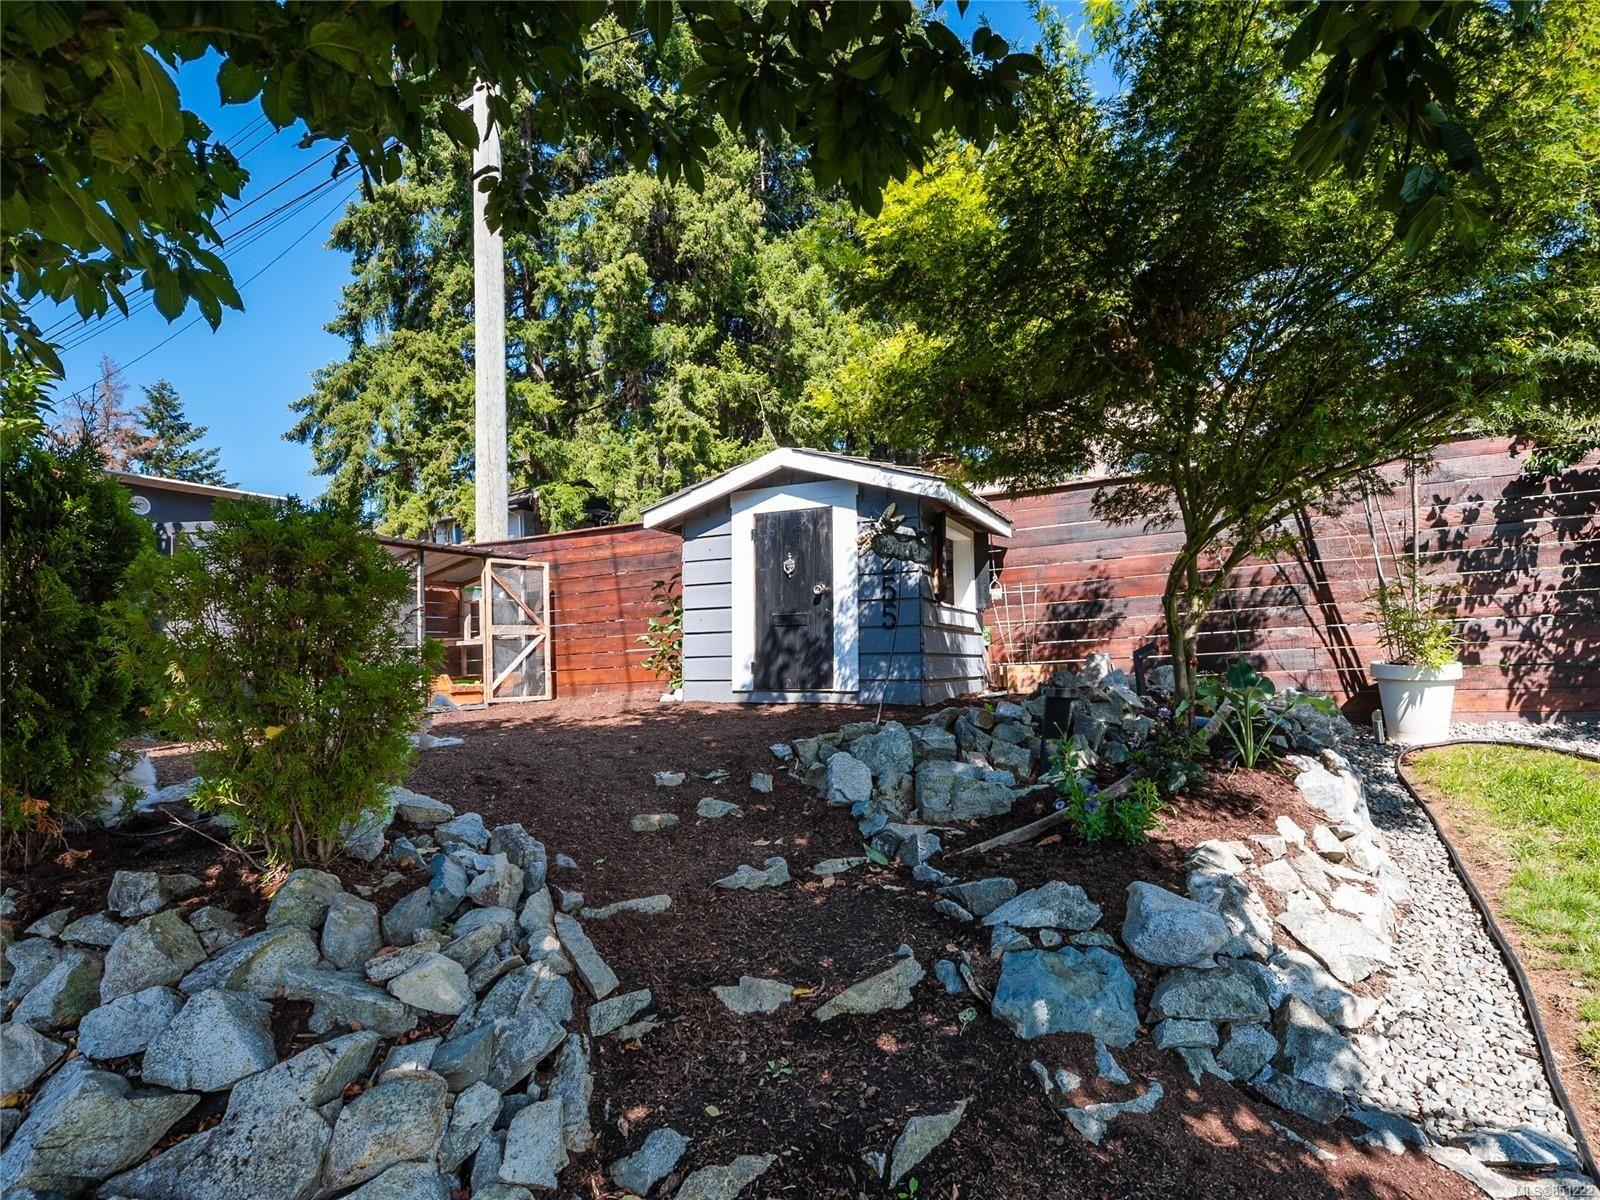 Photo 45: Photos: 2525 11th Ave in : PA Port Alberni House for sale (Port Alberni)  : MLS®# 851222